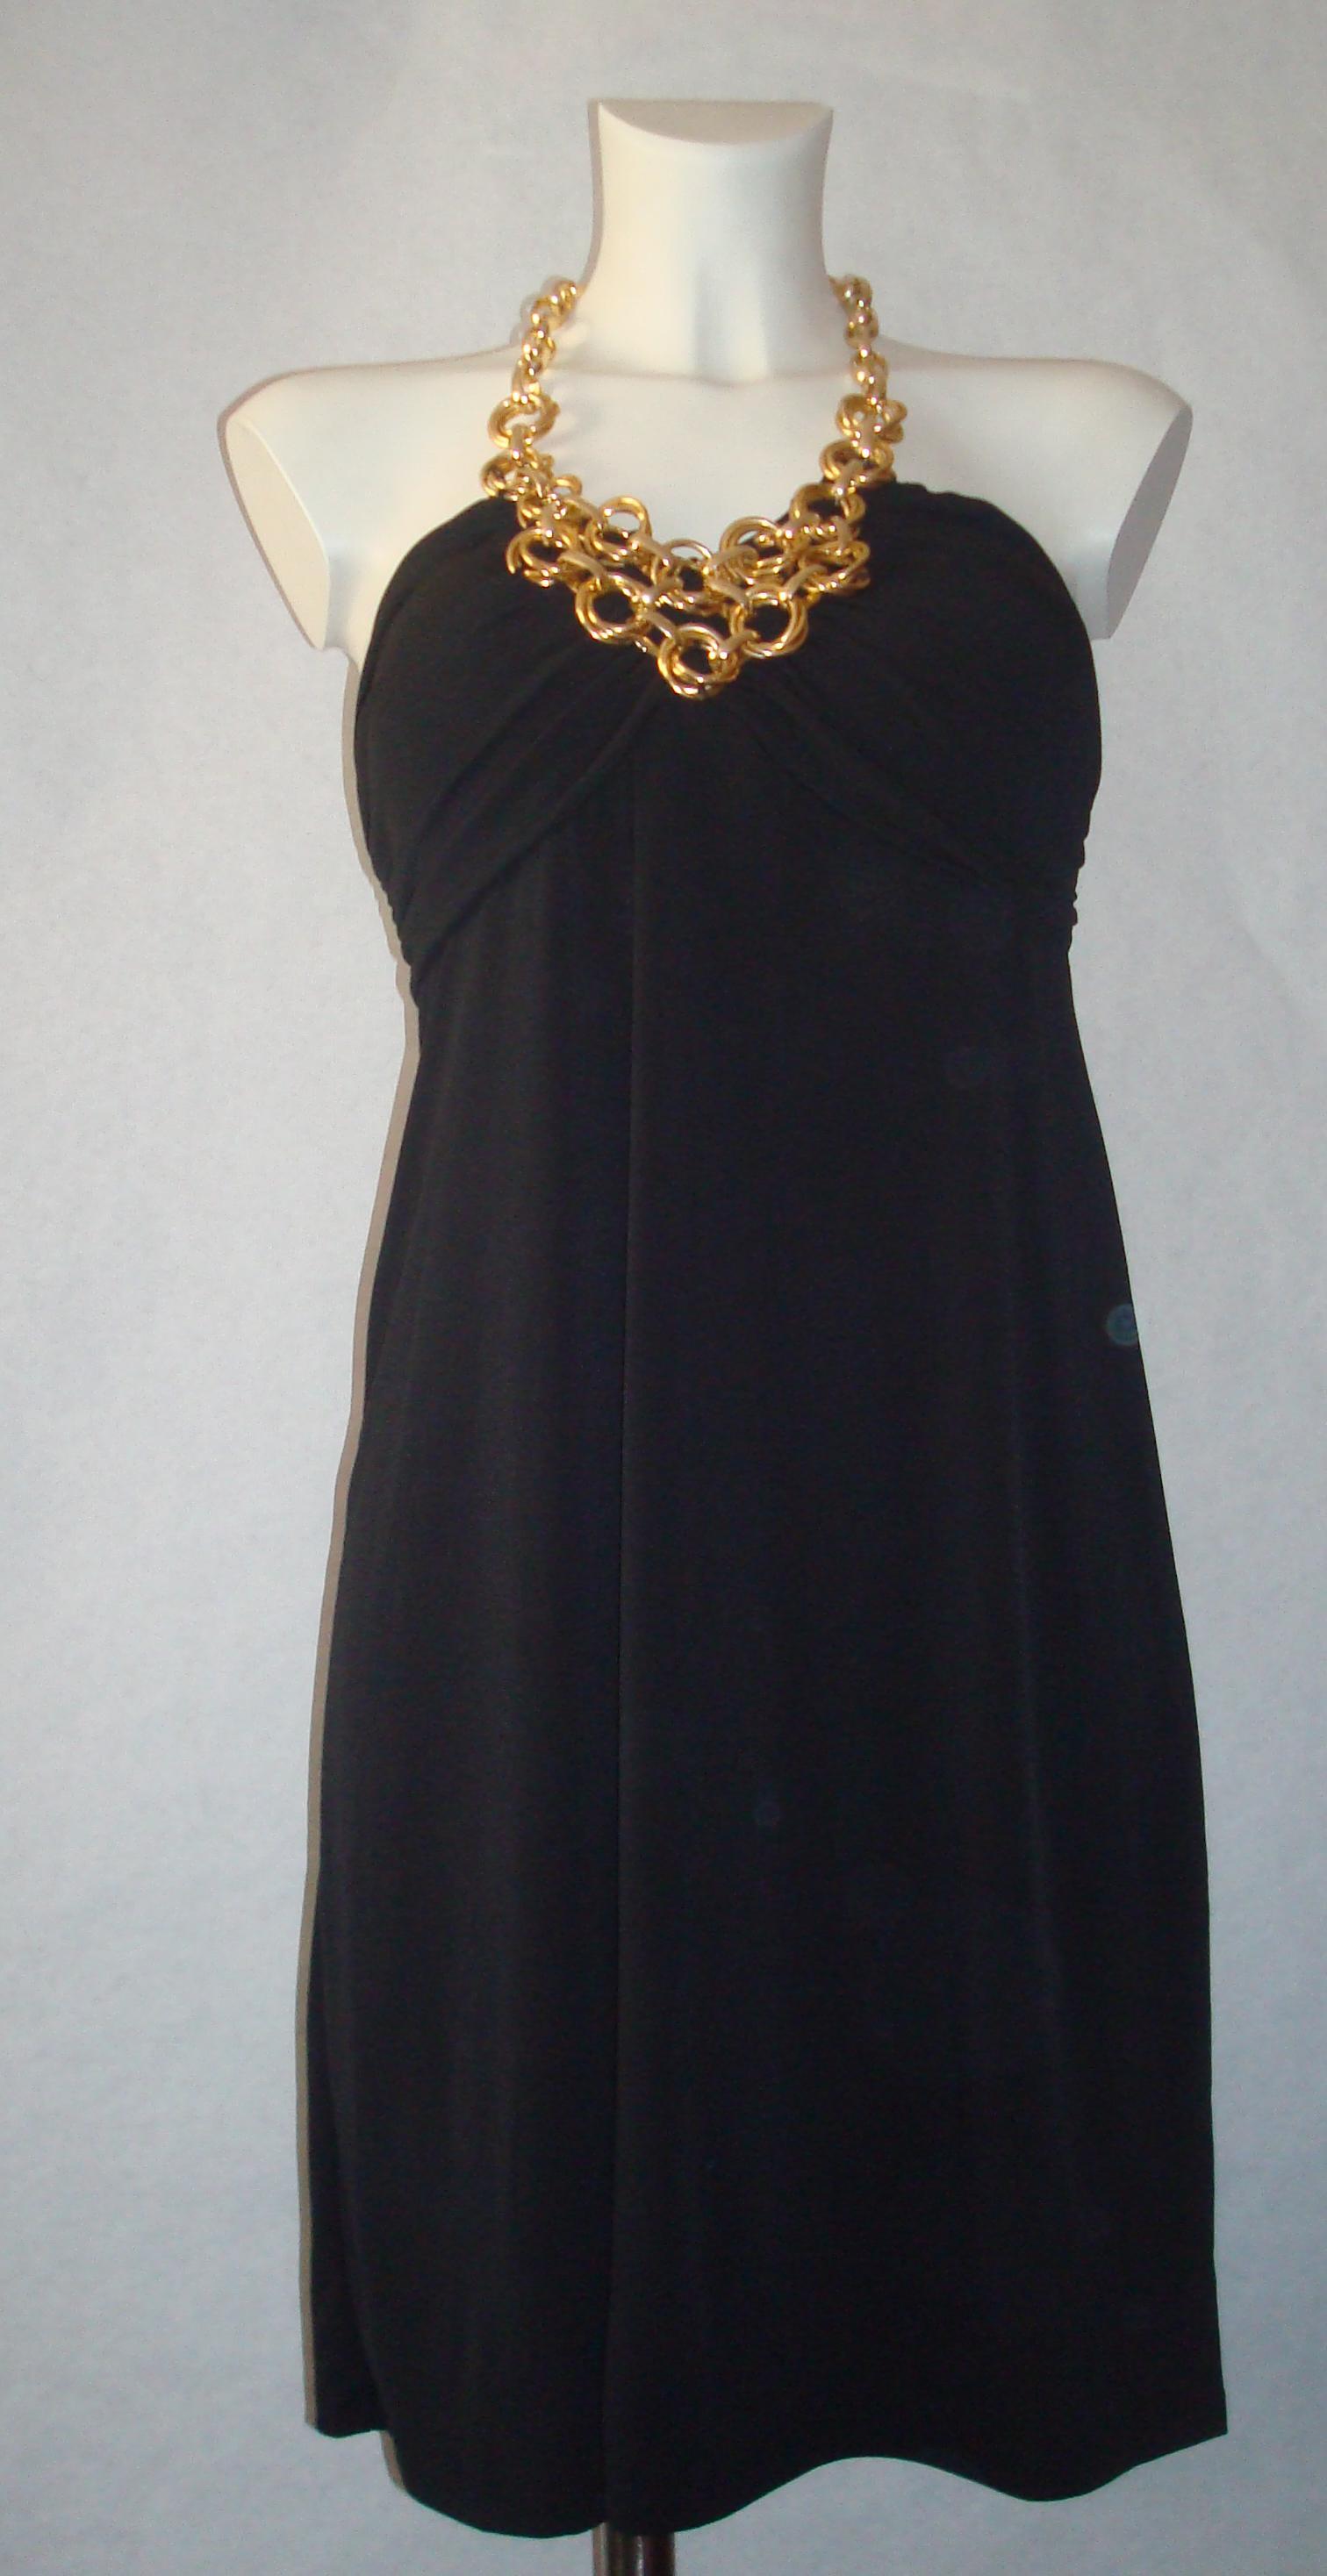 Vestido negro con collar dorado